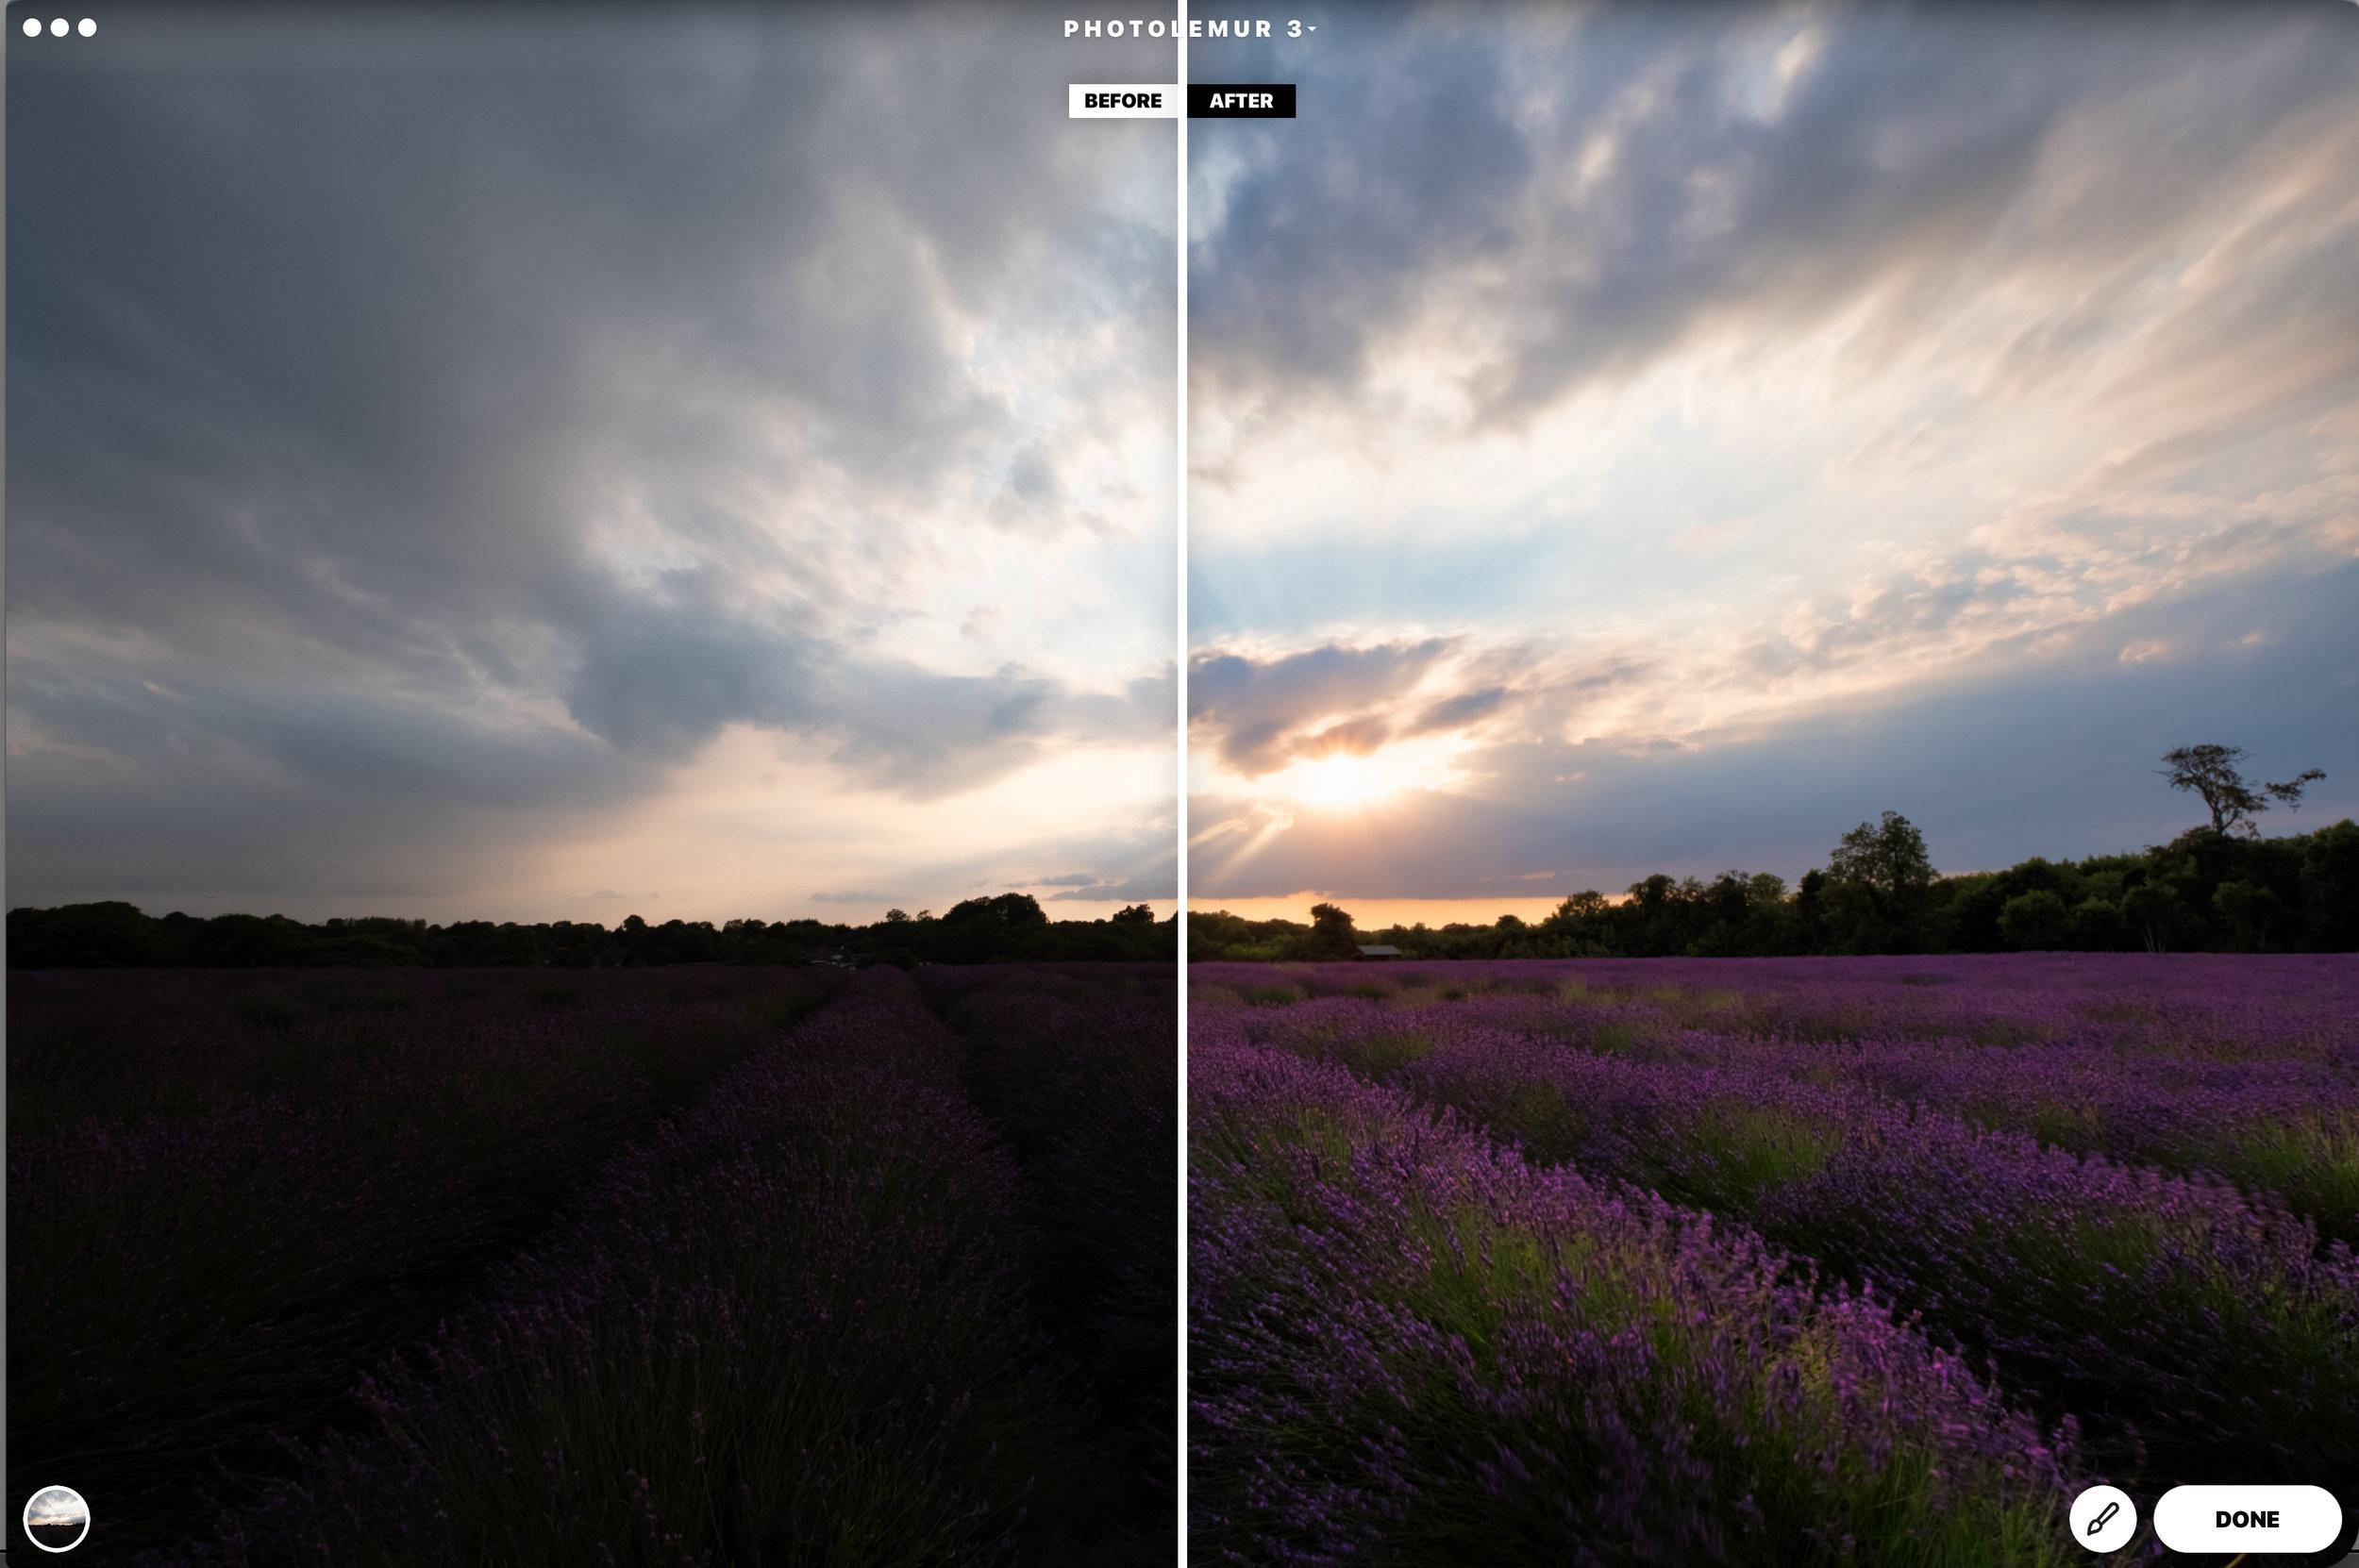 Lavender Field Edited in Photolemur 3